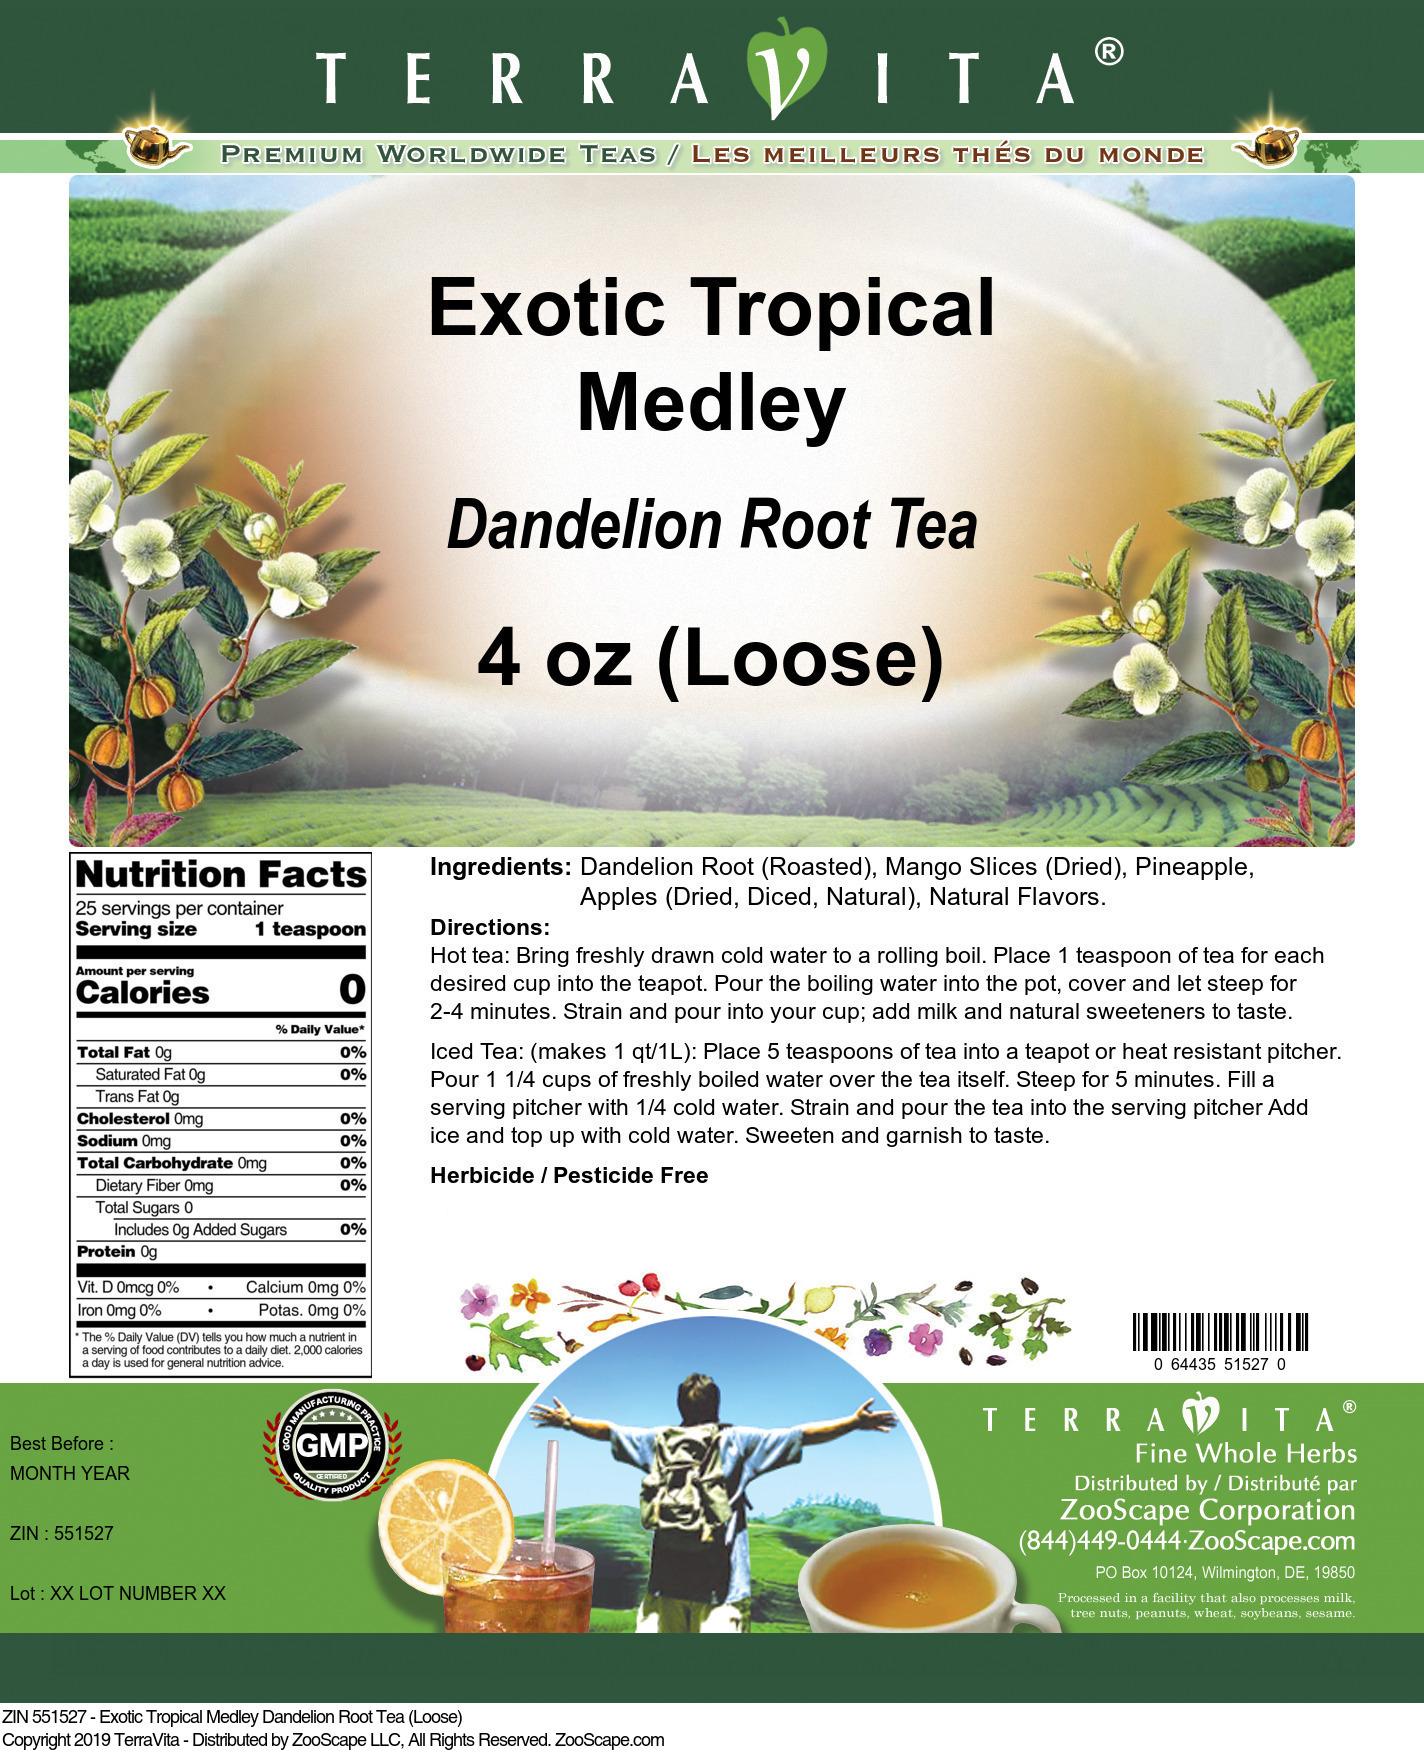 Exotic Tropical Medley Dandelion Root Tea (Loose)